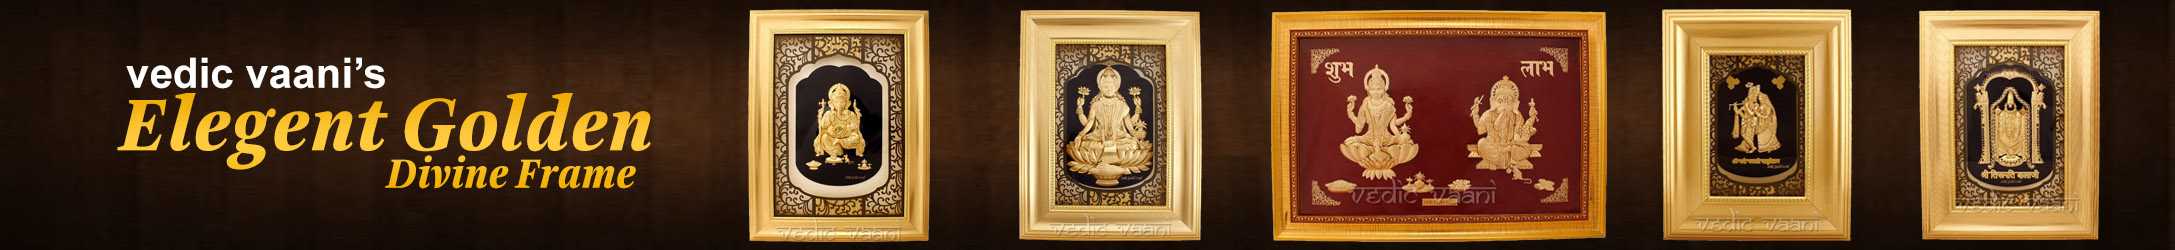 Elegant Golden Divine Frame